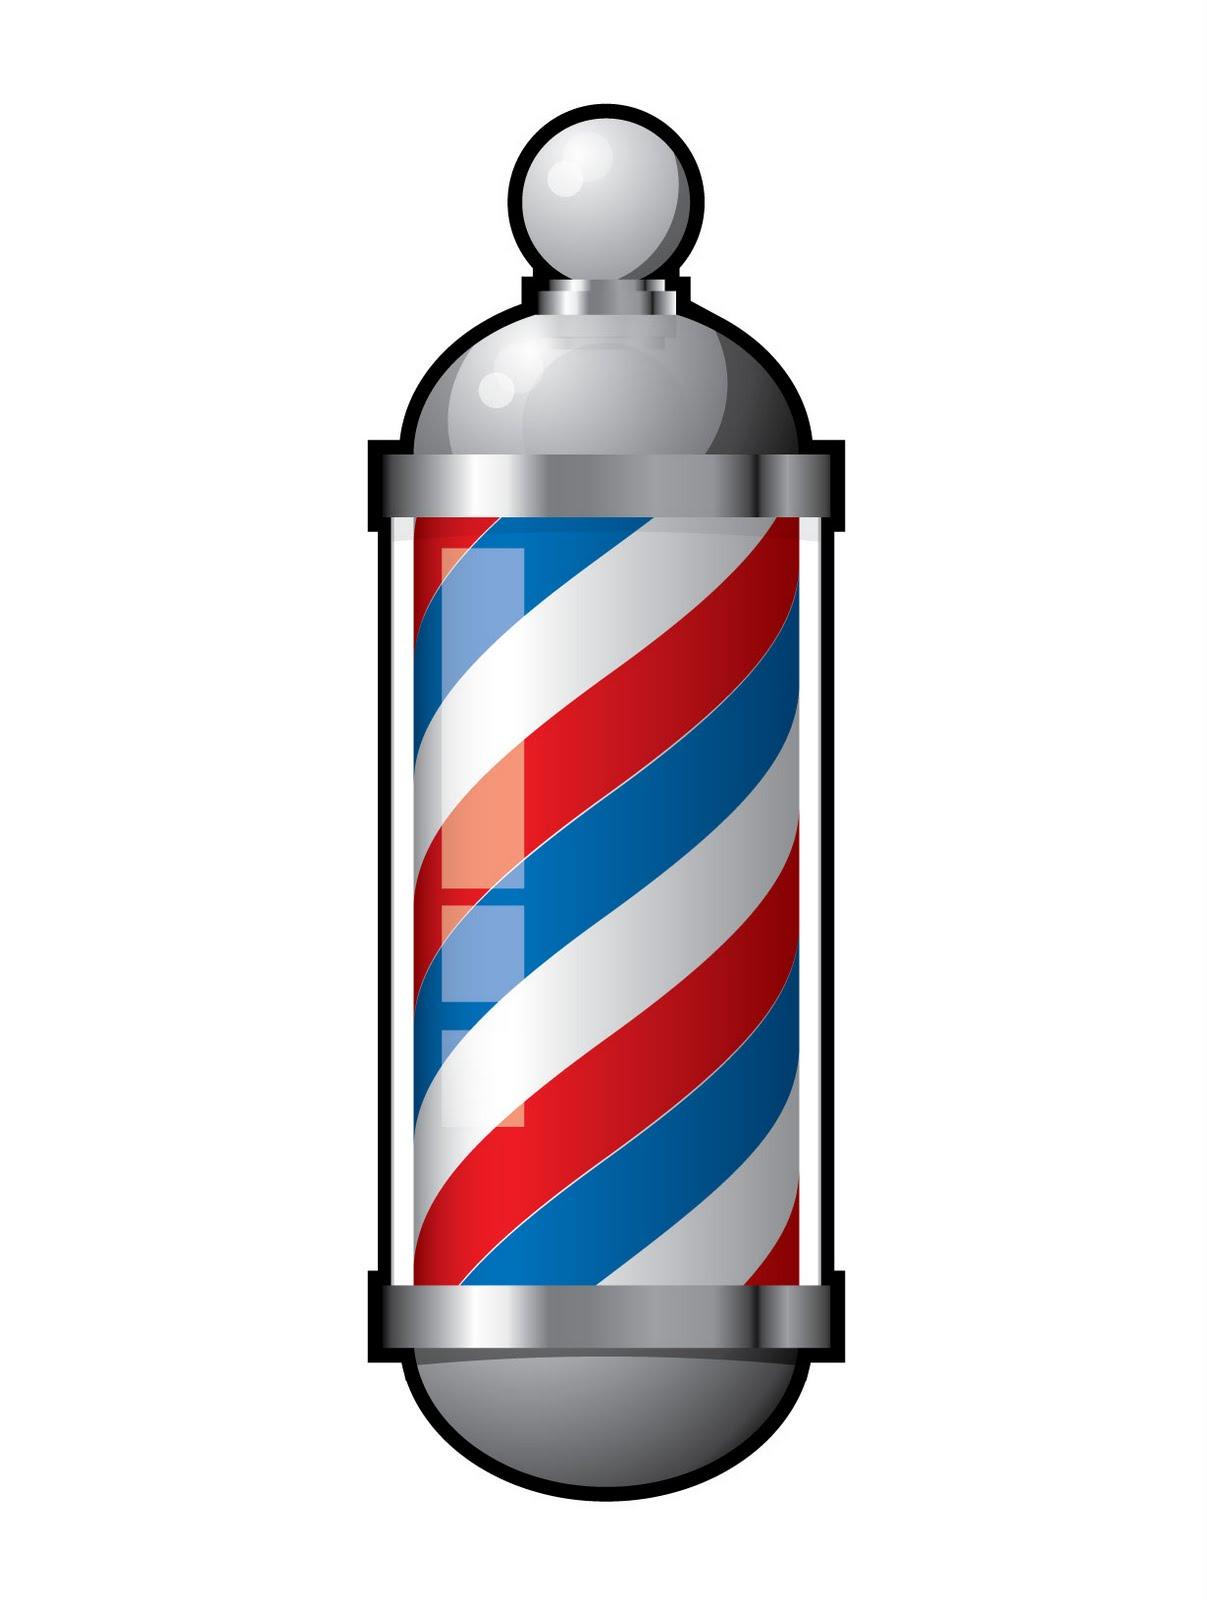 Barber shop symbol clipart image royalty free download Barber Shop Pole Clipart | Free download best Barber Shop Pole ... image royalty free download